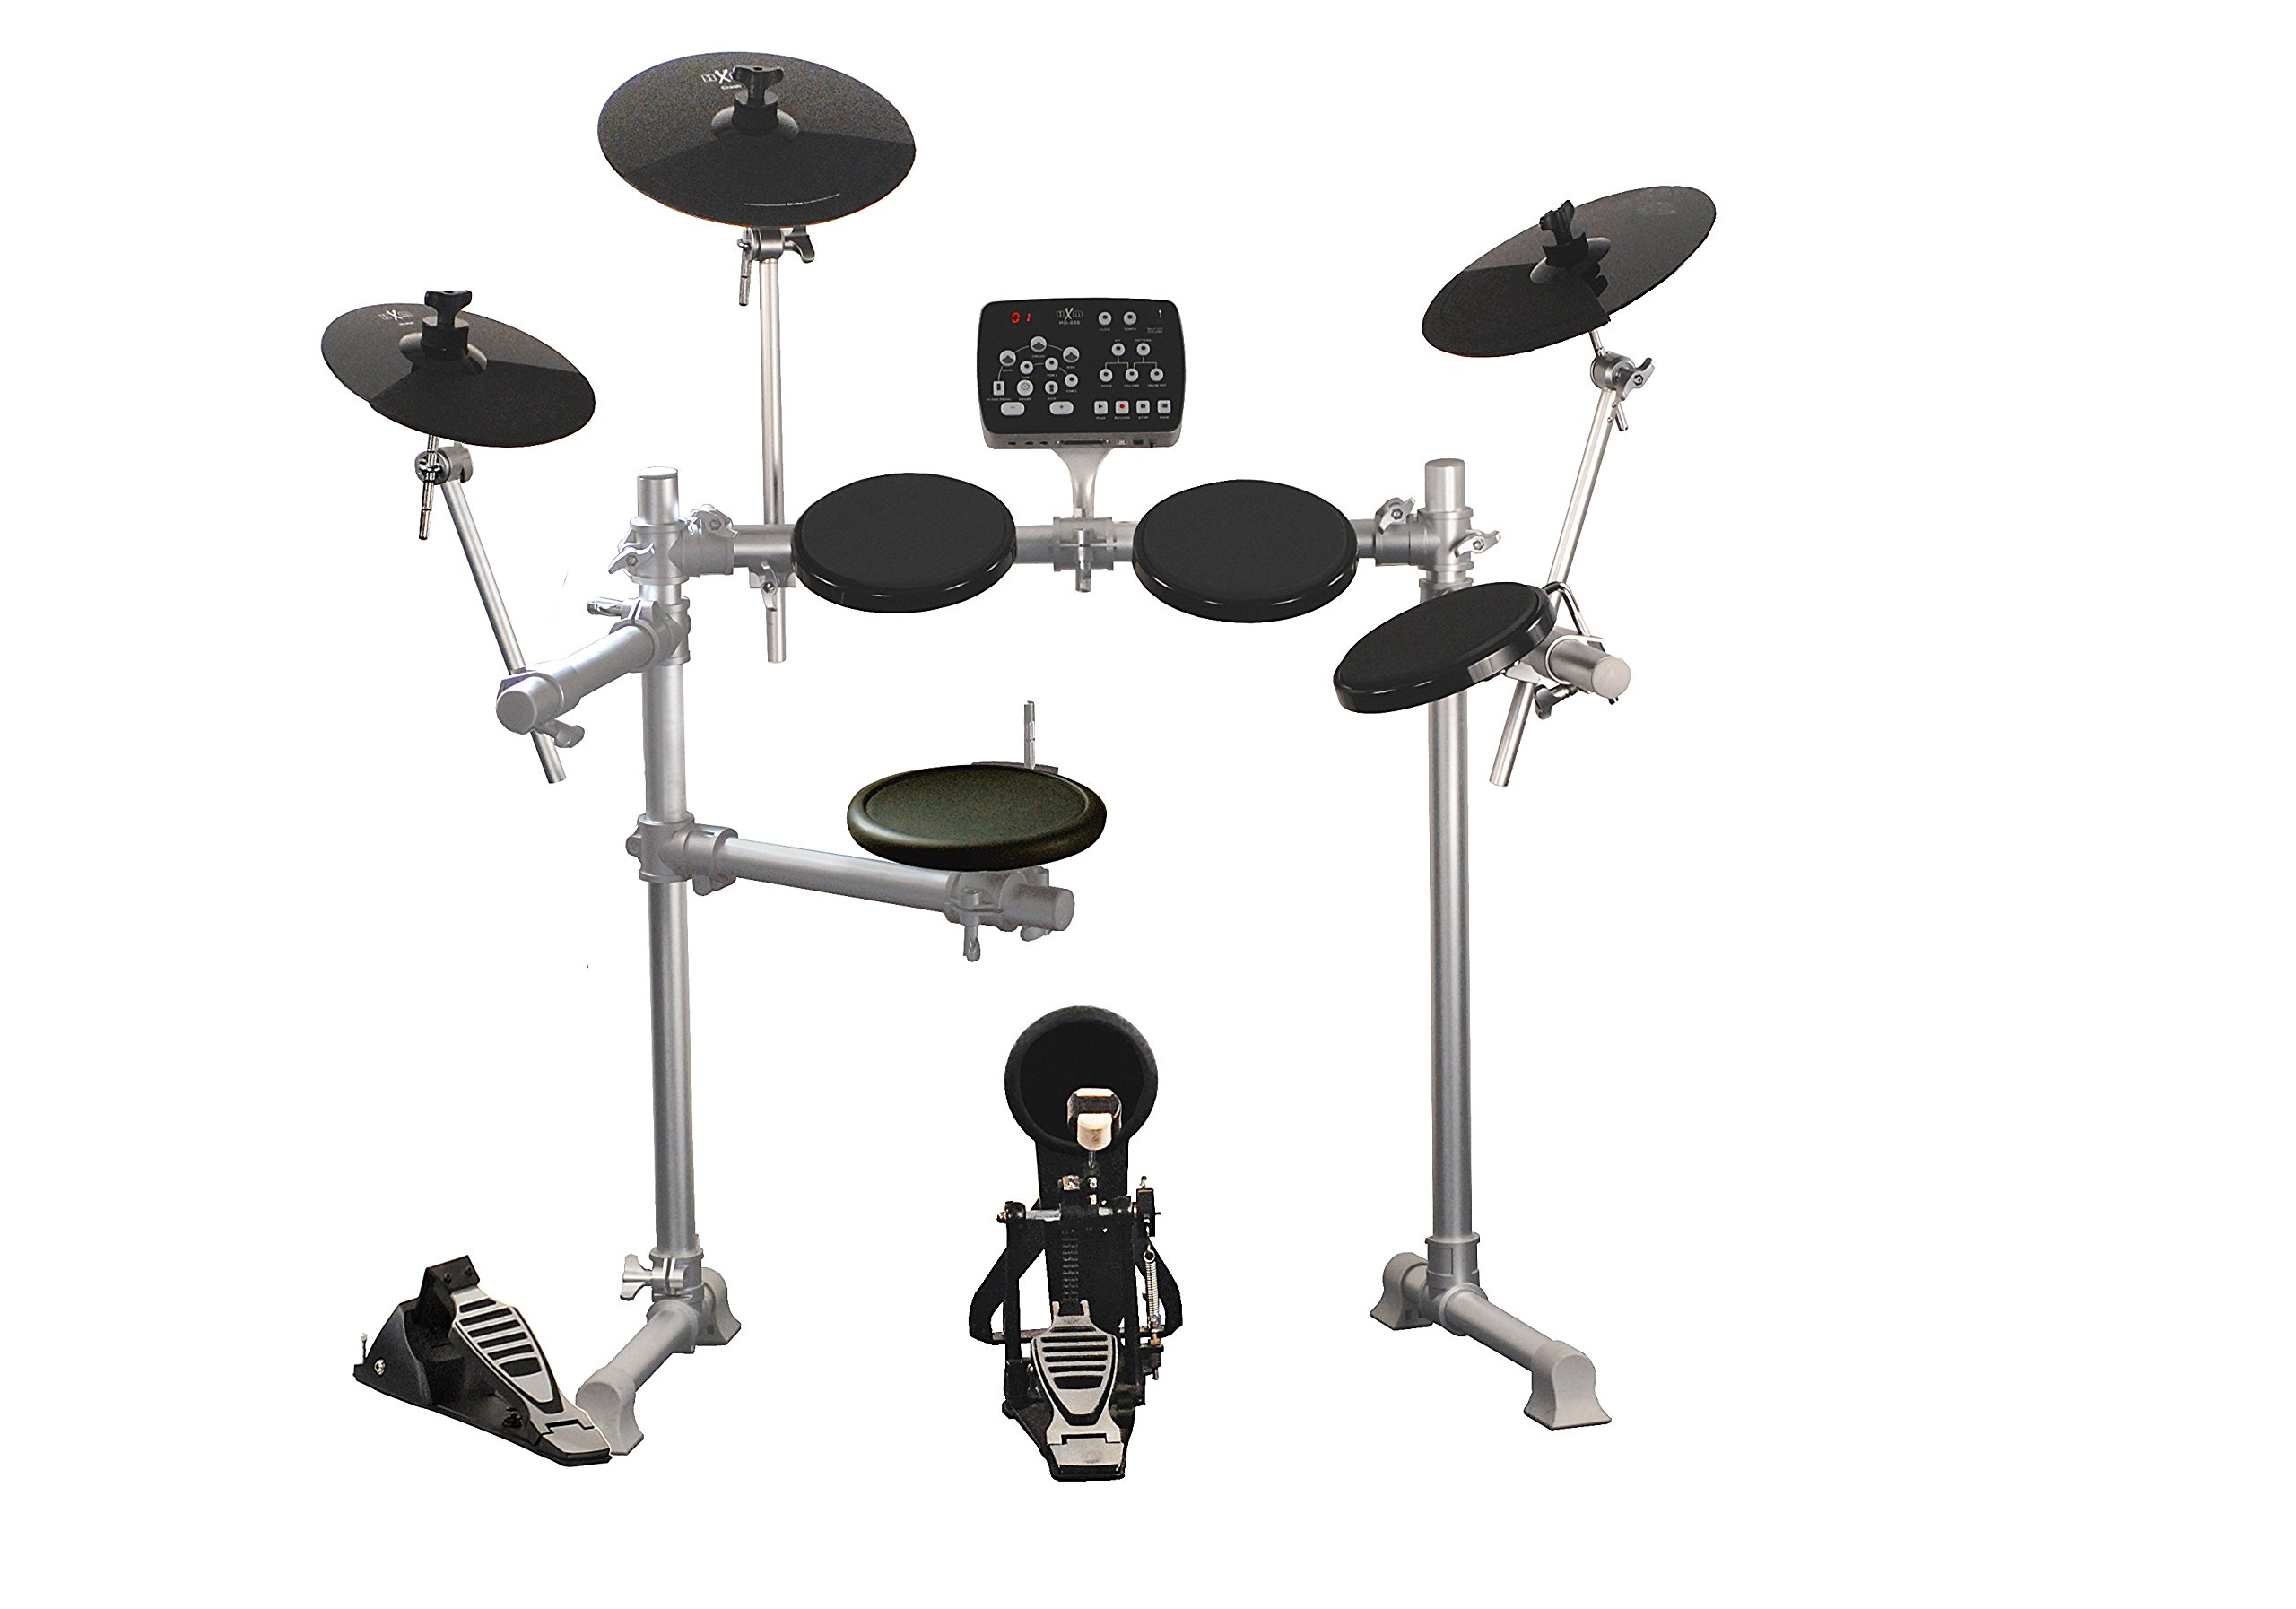 Trinity HD-11 Digital Drum Kit, Black